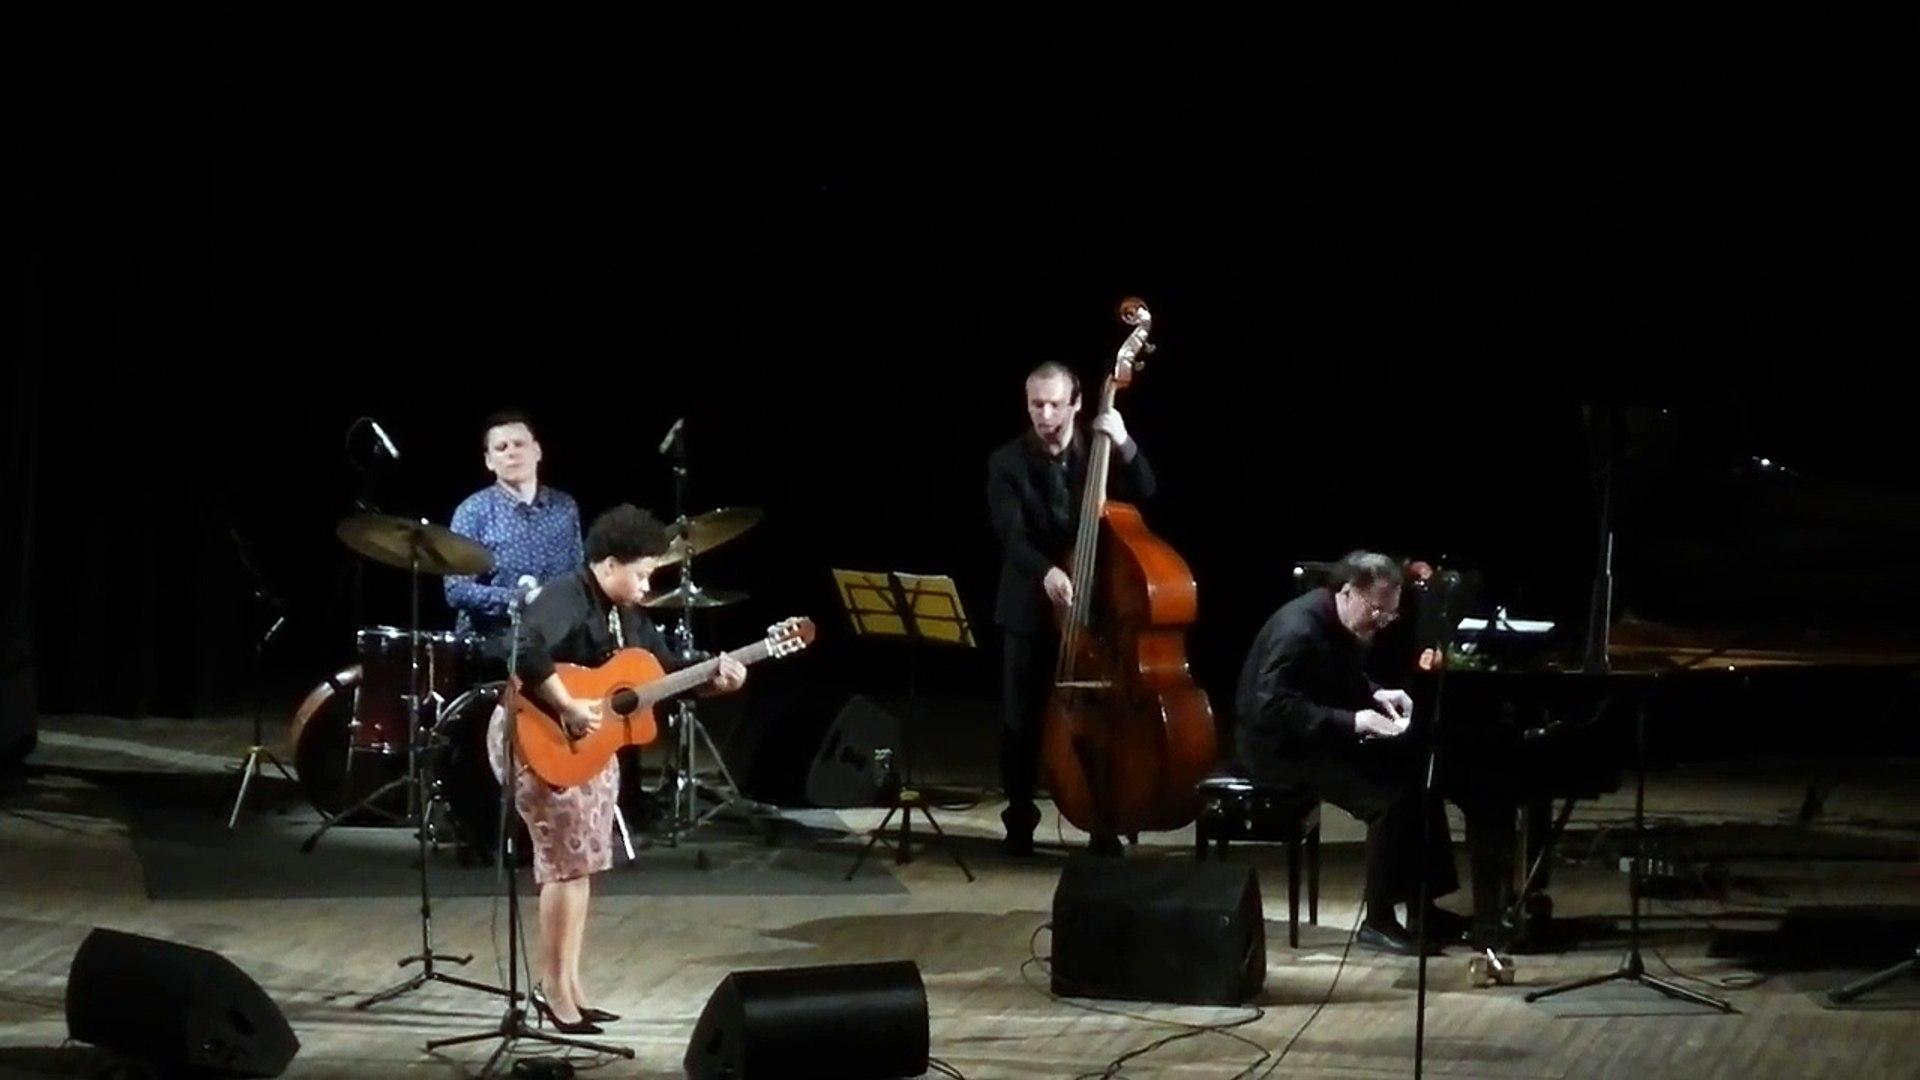 Вечер джаза с Даниилом Крамером «Lady in Jazz»: Надя Вашингтон и зал